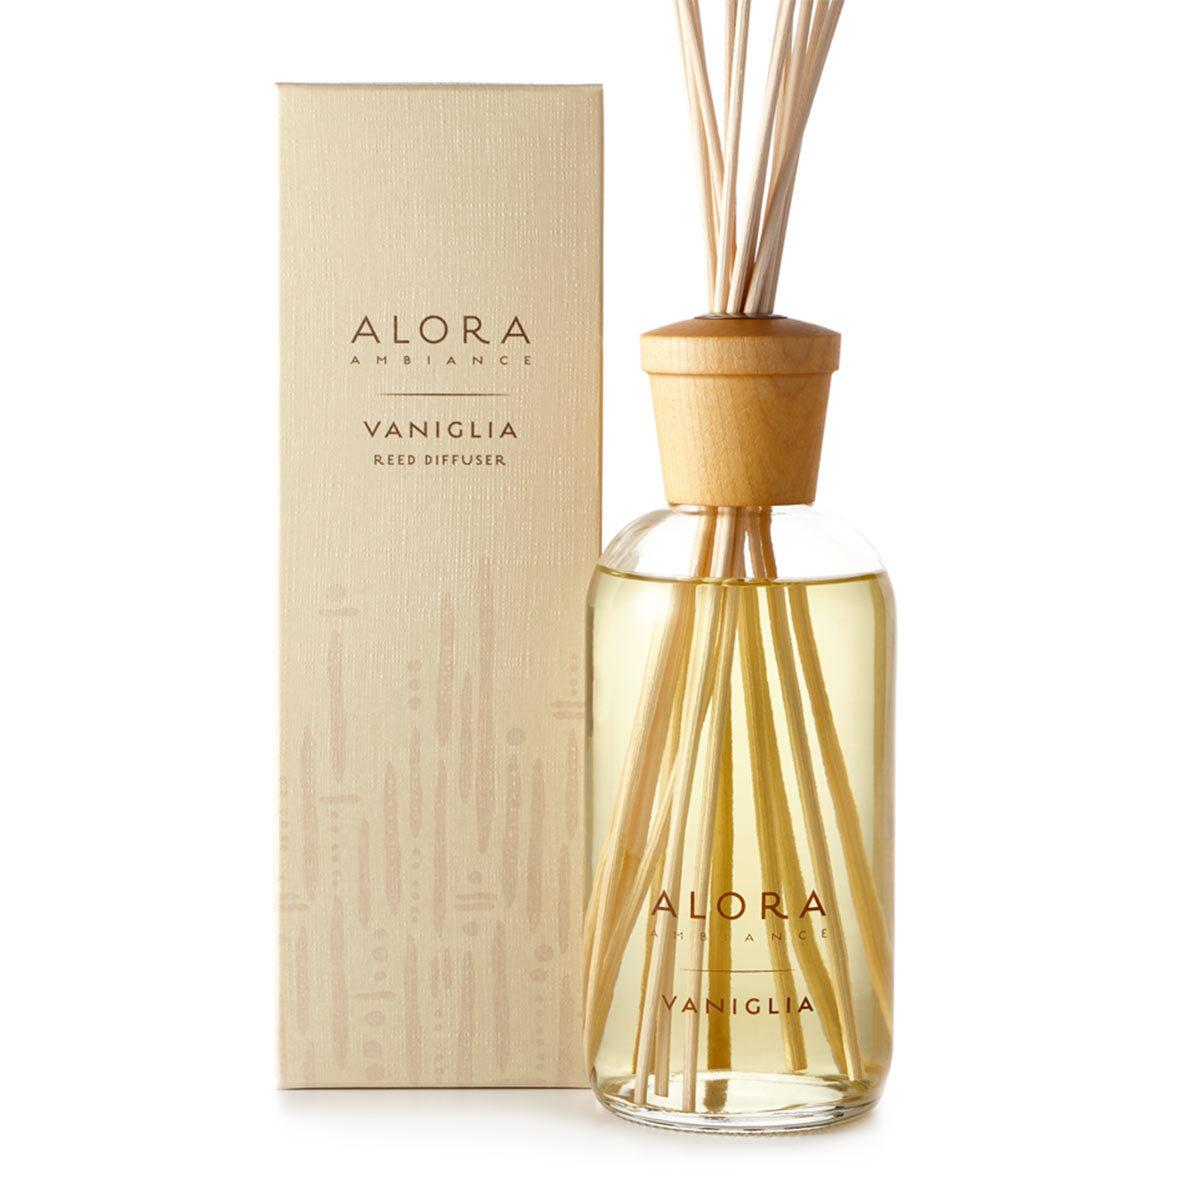 Alora Ambiance - Vaniglia